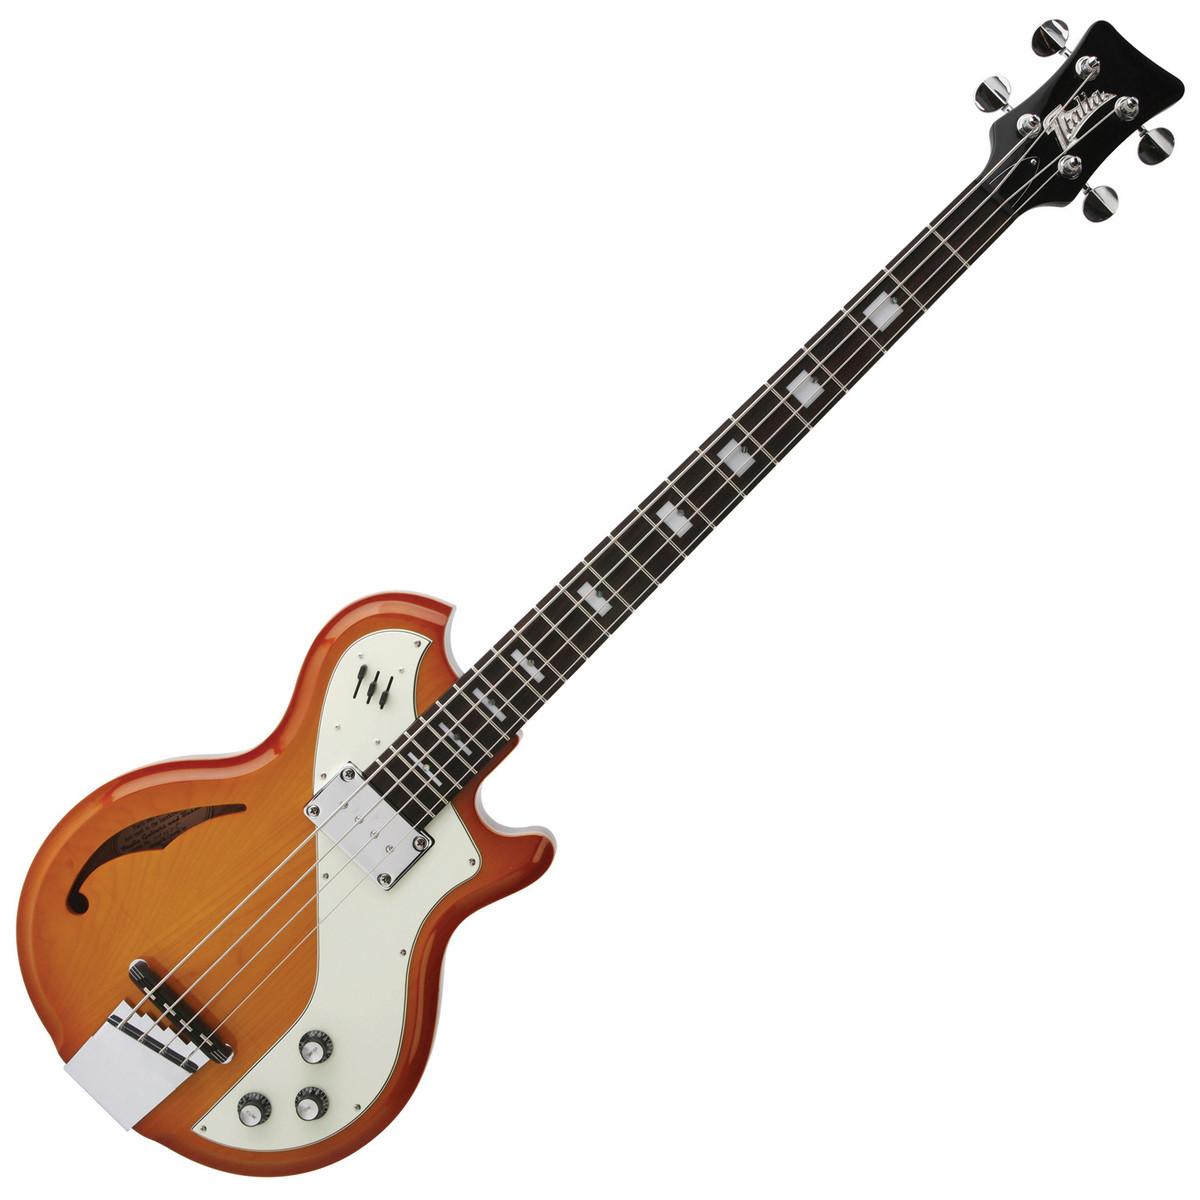 guitare basse deluxe italia mondial cherry sunburst avec housse. Black Bedroom Furniture Sets. Home Design Ideas